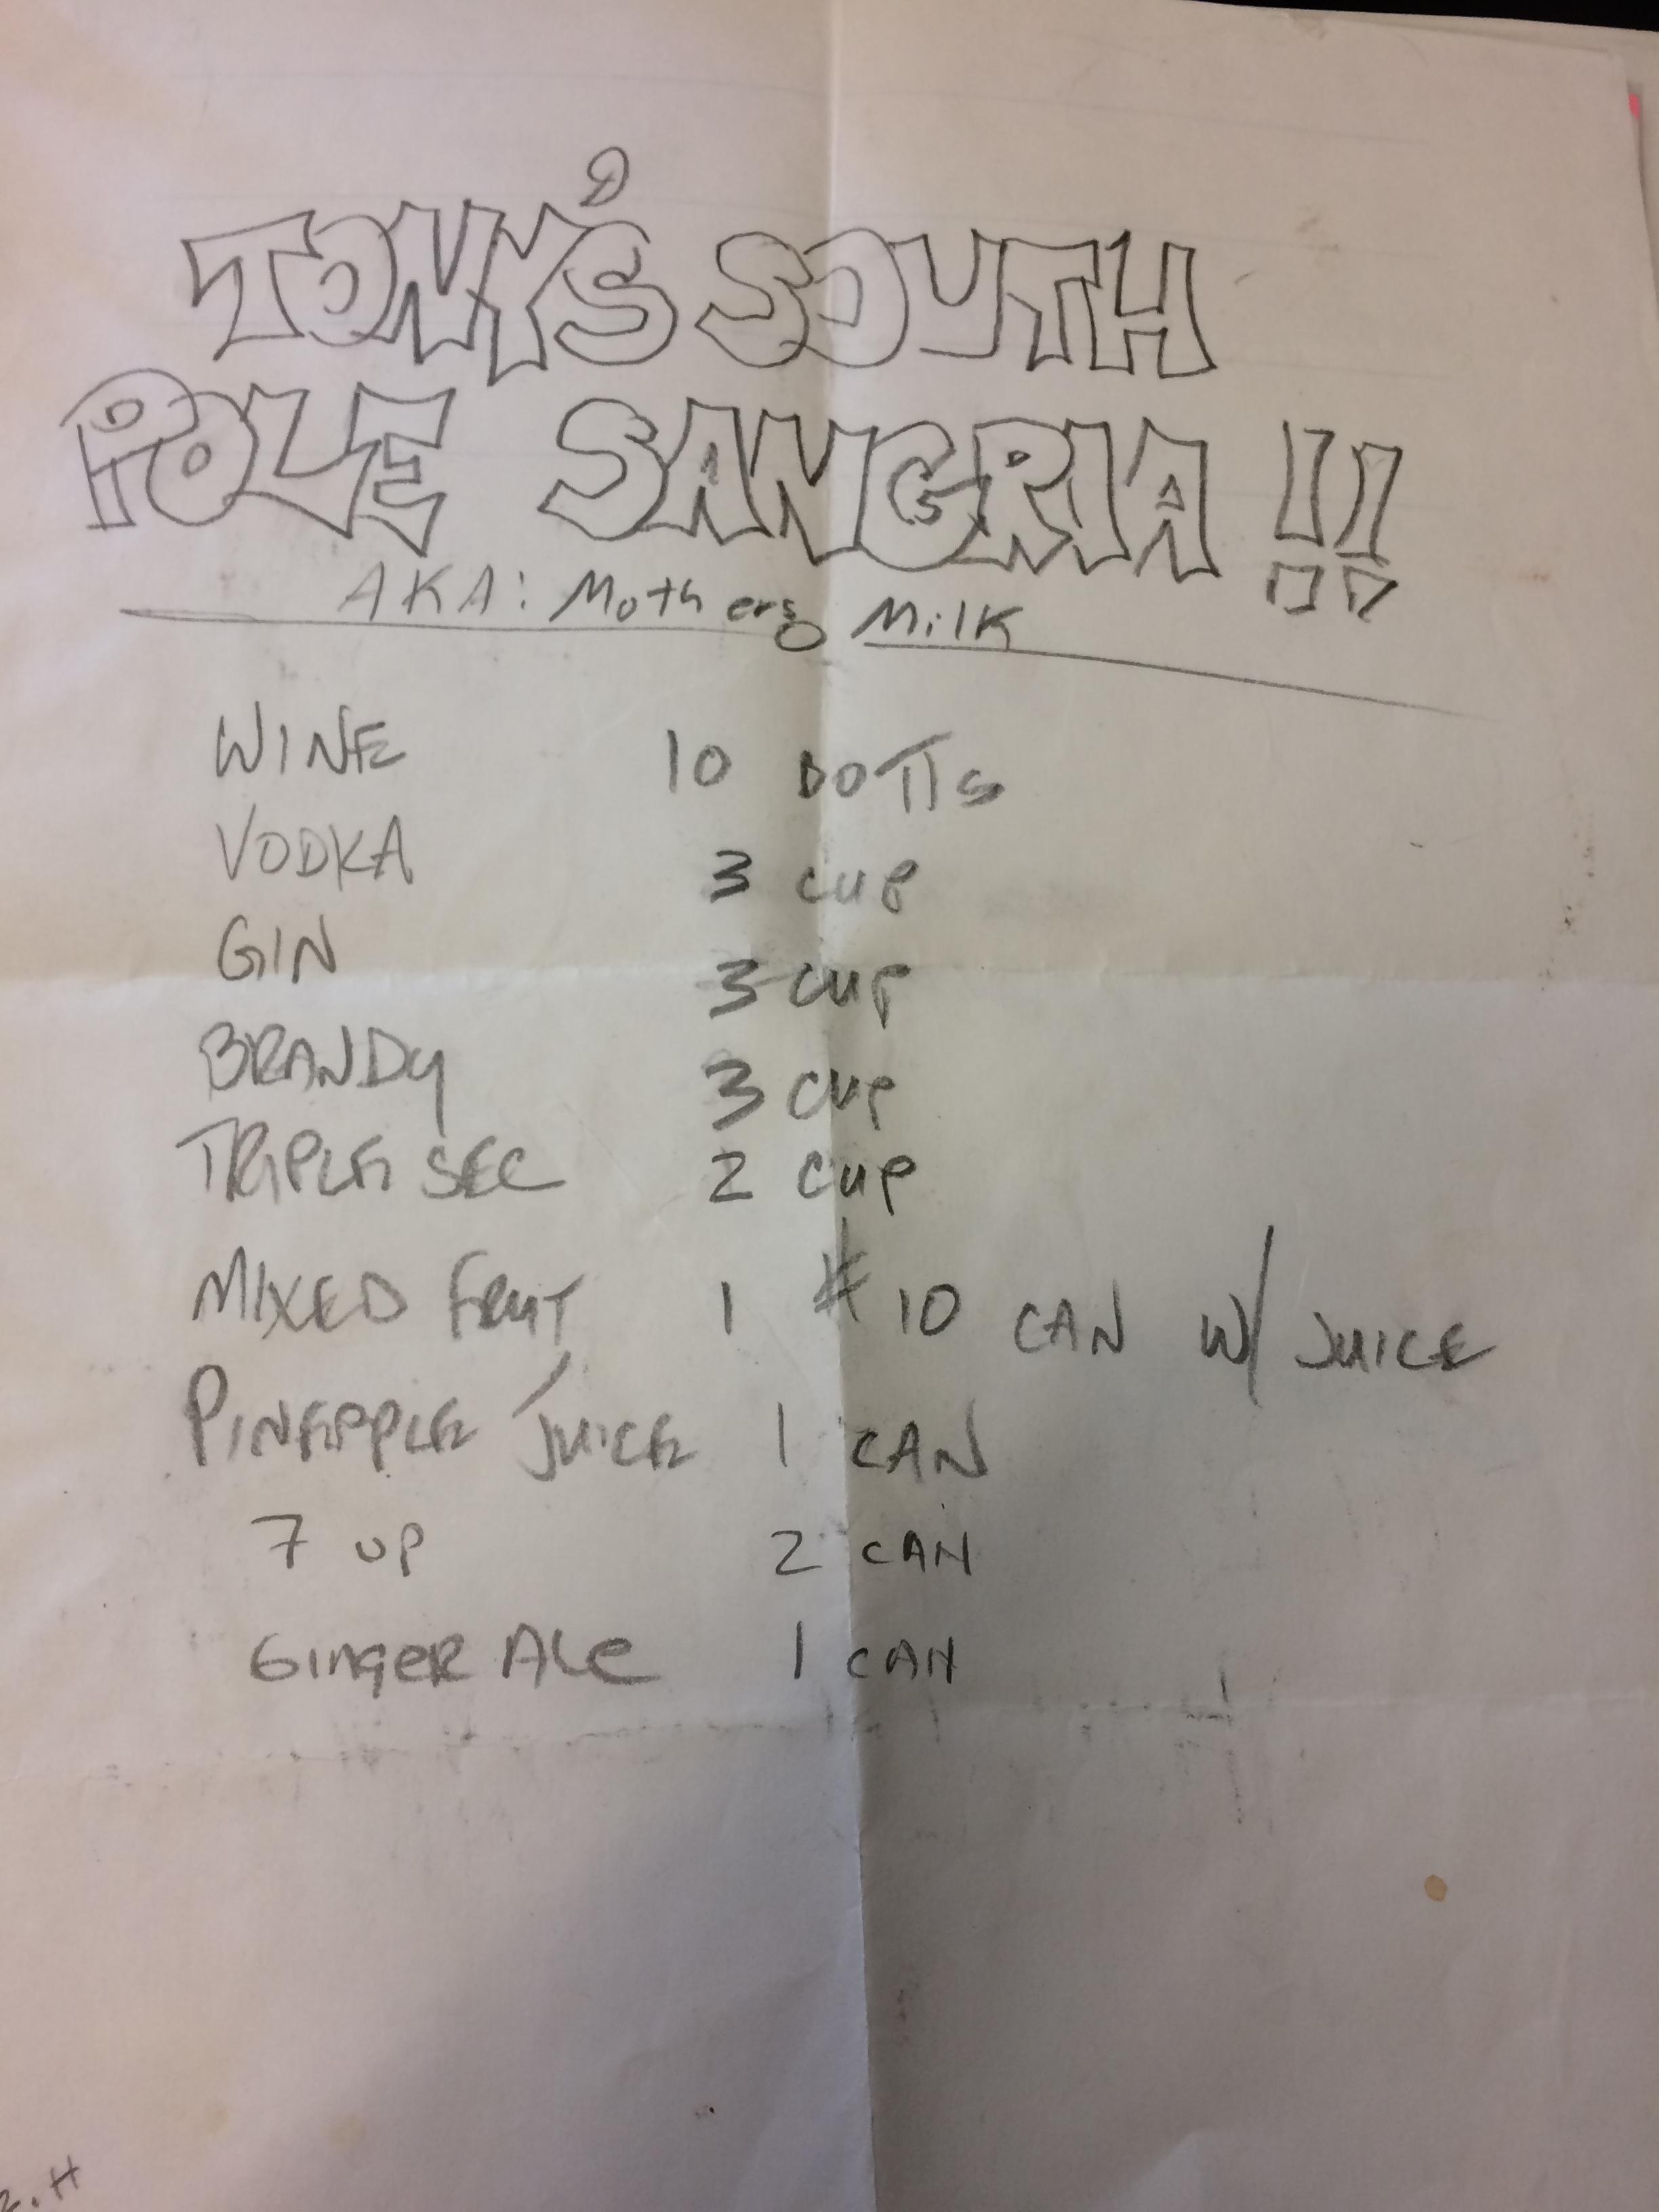 South Pole Sangria a,k.a. Mother's Milk